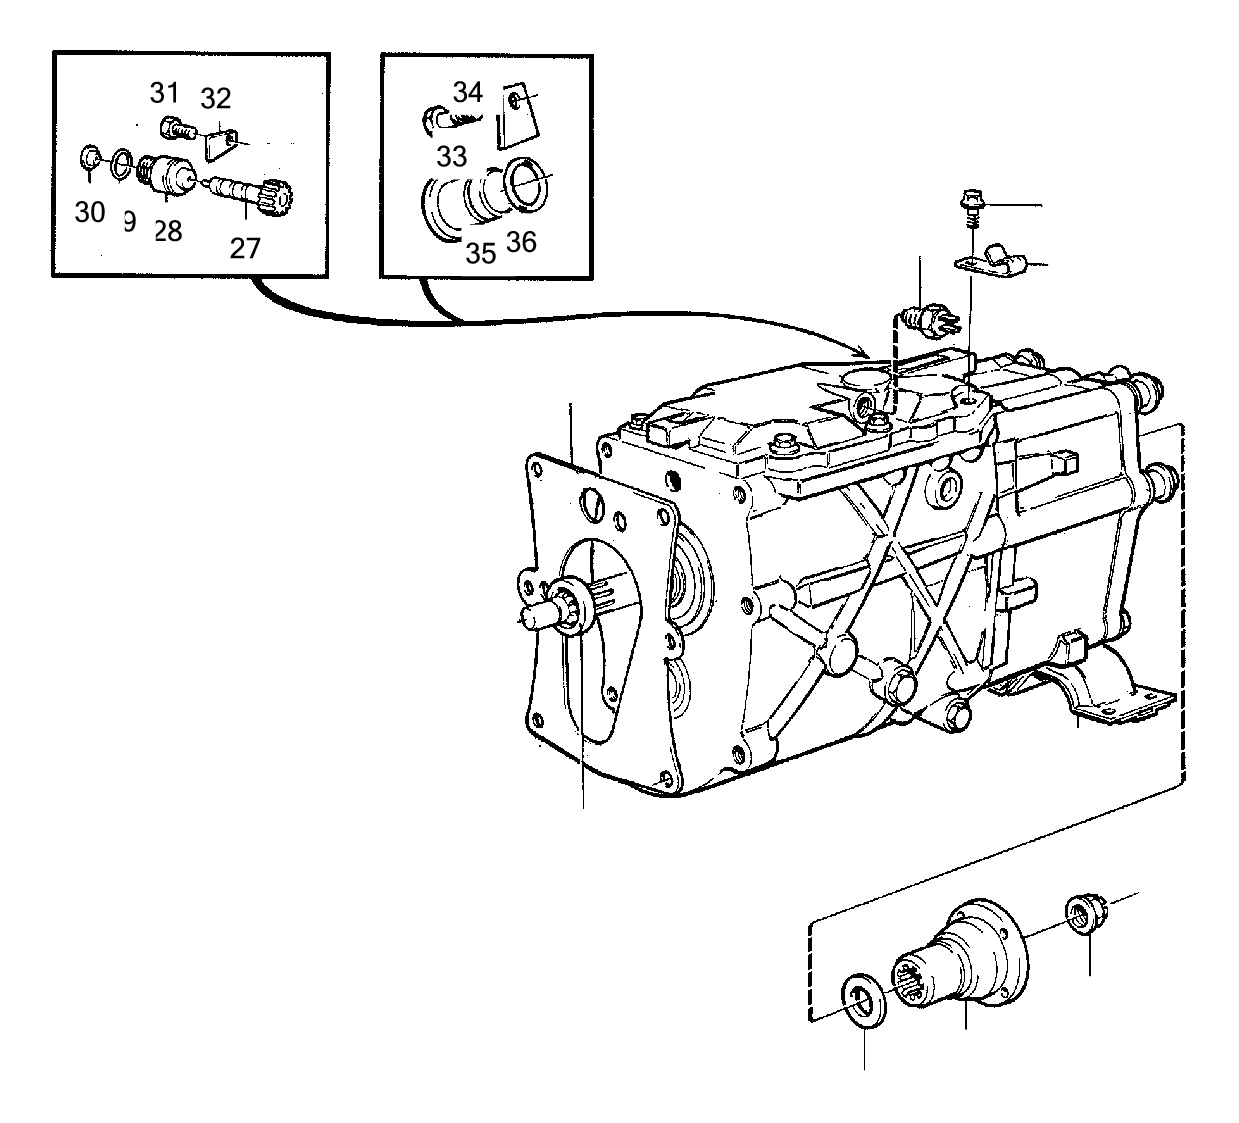 Volvo V70 2.5l 5 cylinder Turbo Reverse light switch